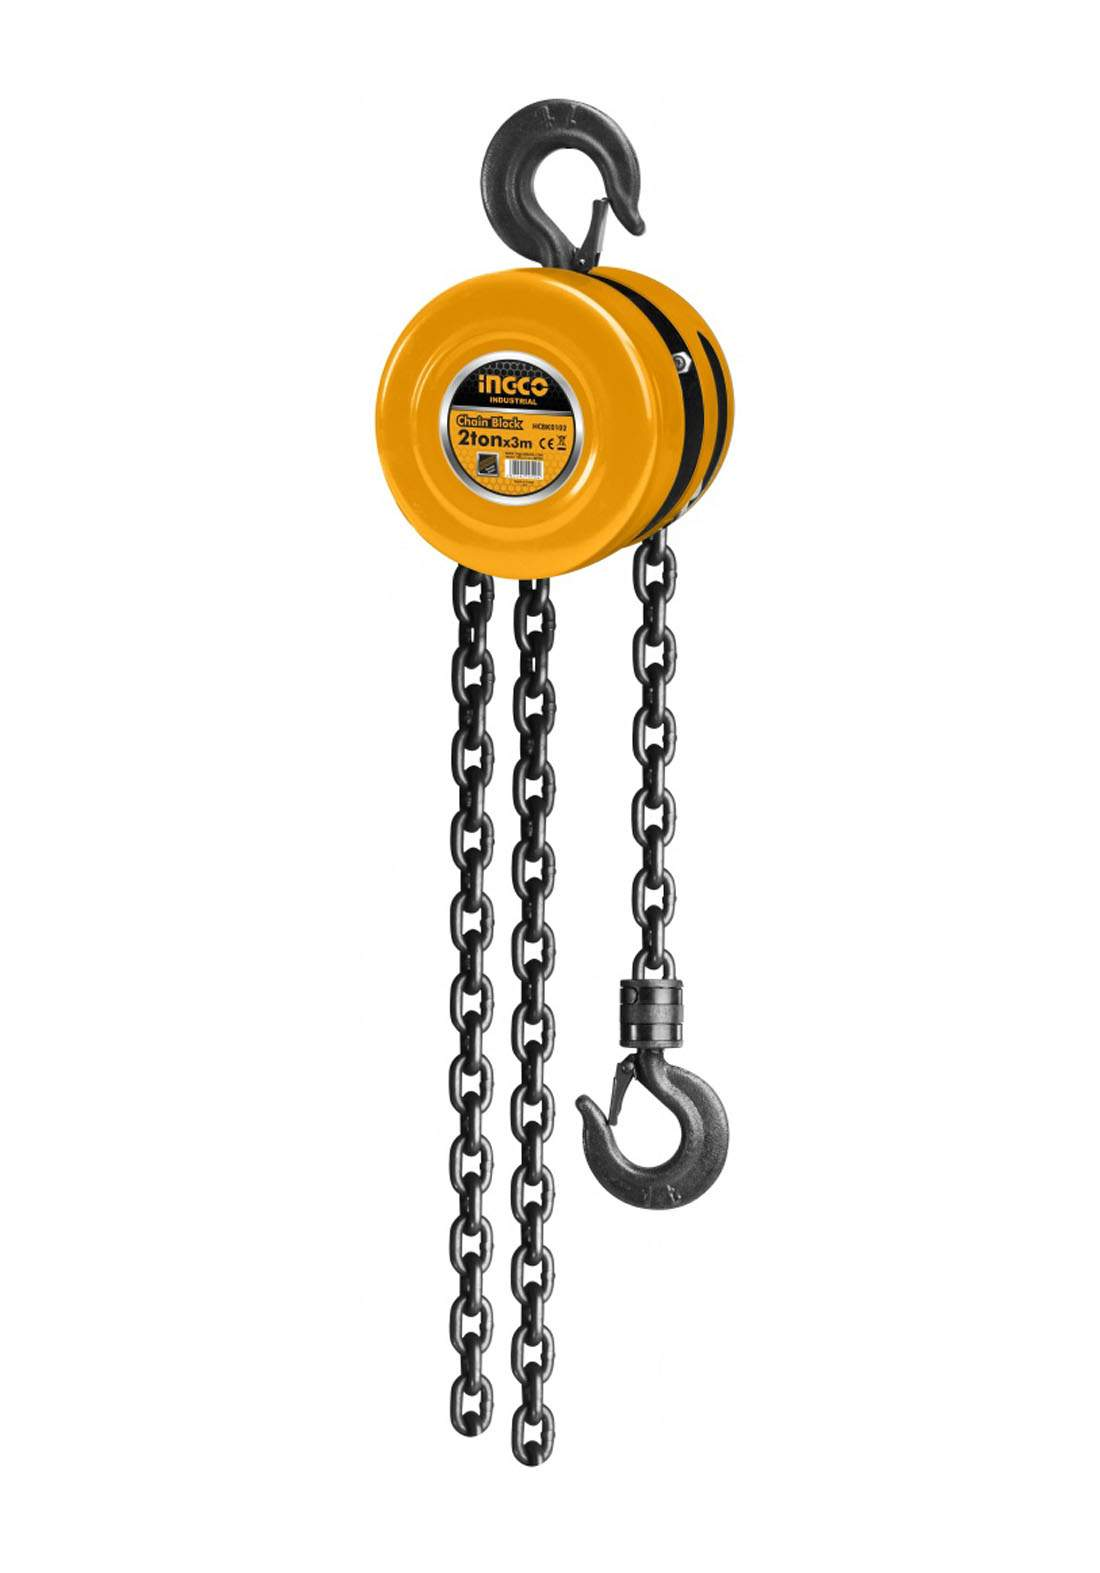 Ingco HCBK0102 Chain Block 2 Ton بكرة سحب